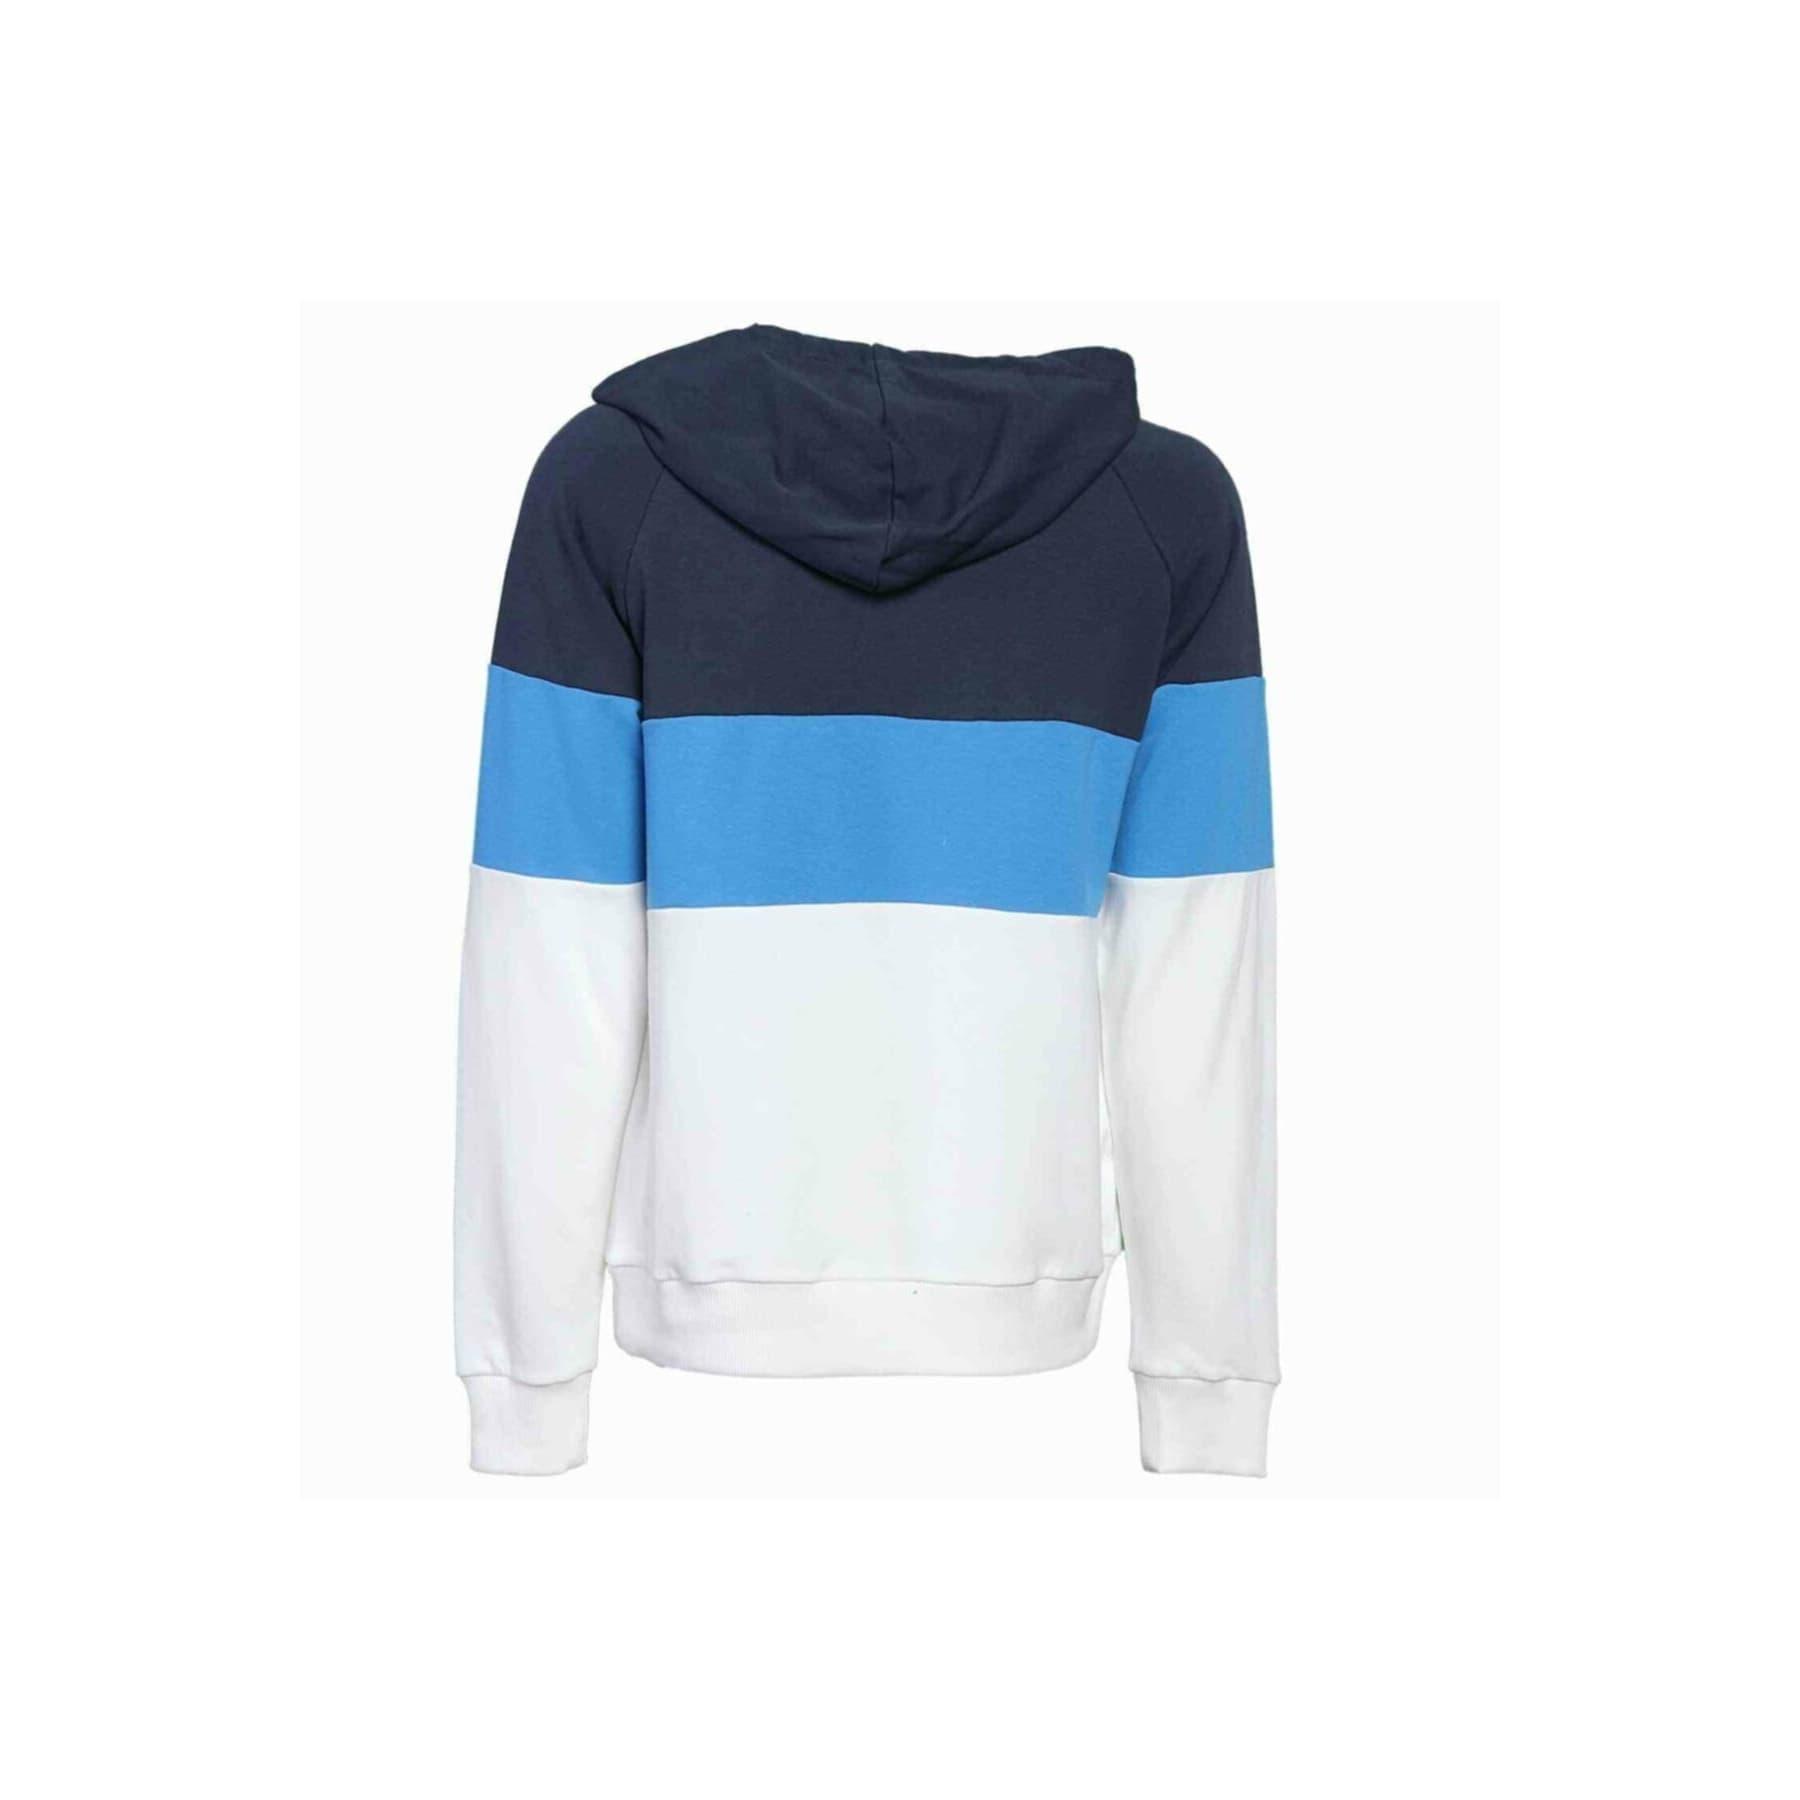 Hummel Oplion Erkek Mavi Sweatshirt (921165-2010)